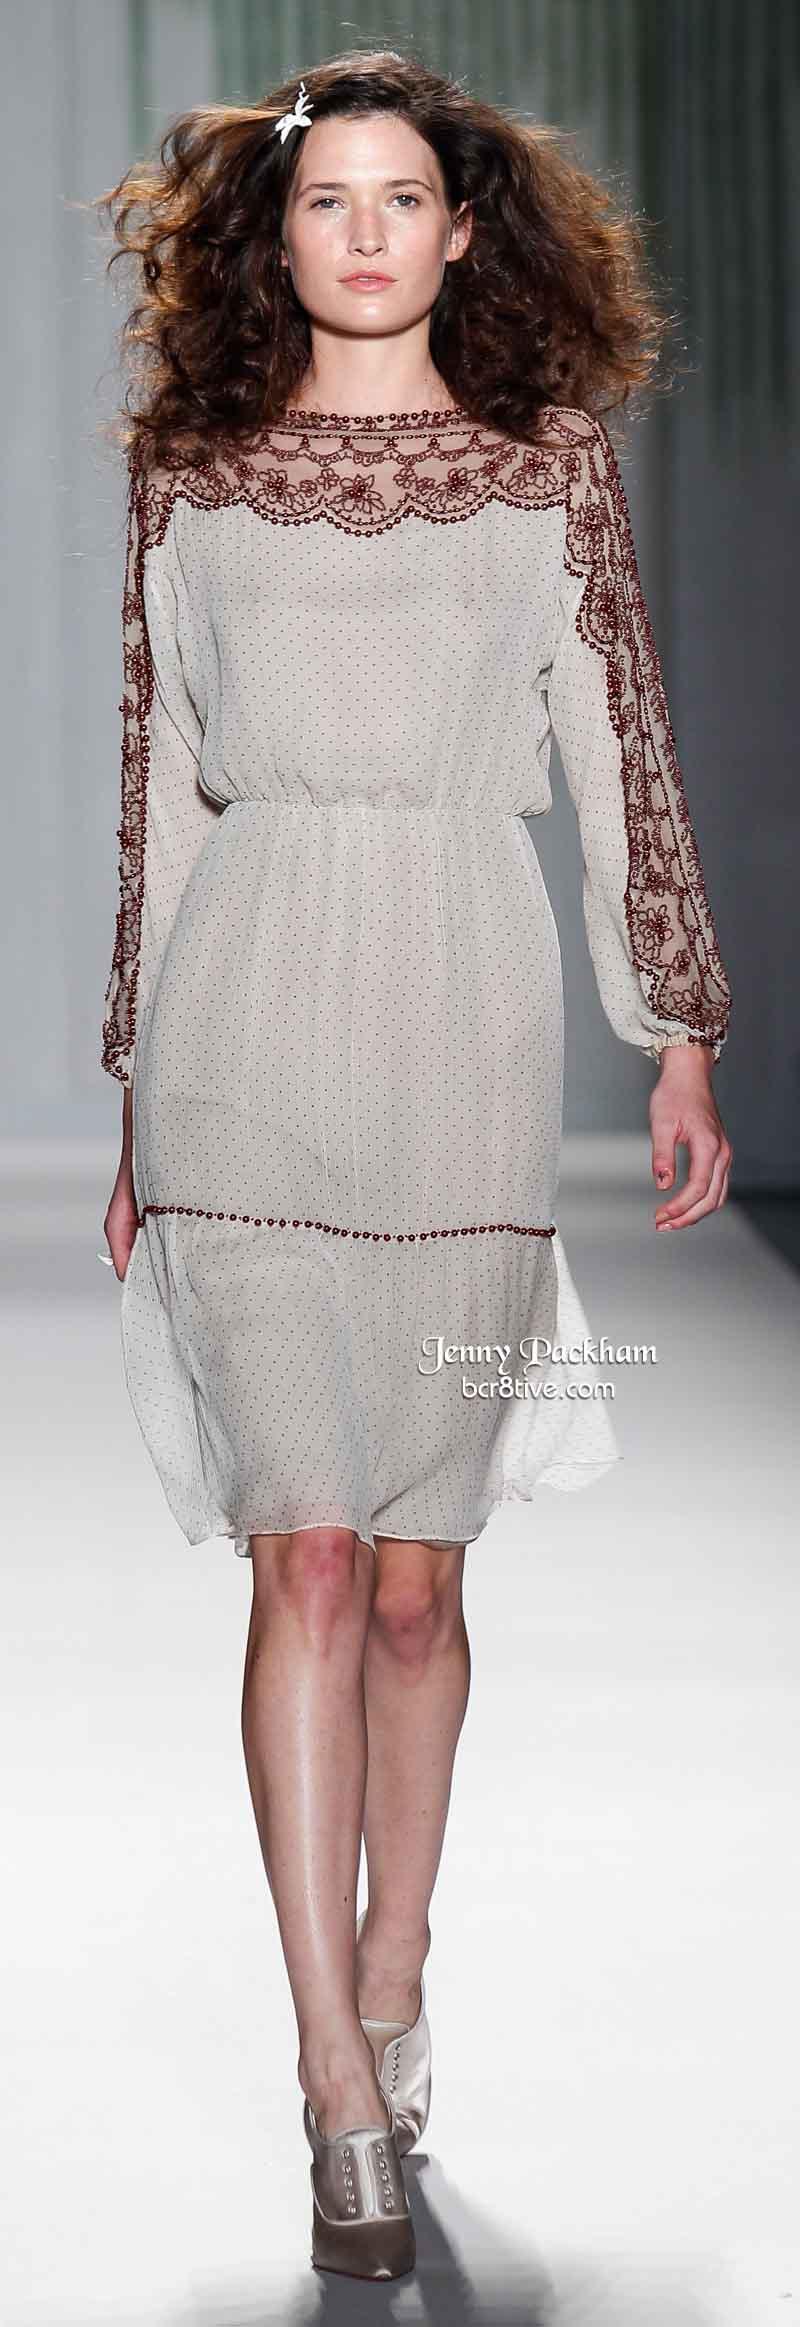 Jenny Packham Spring 2014